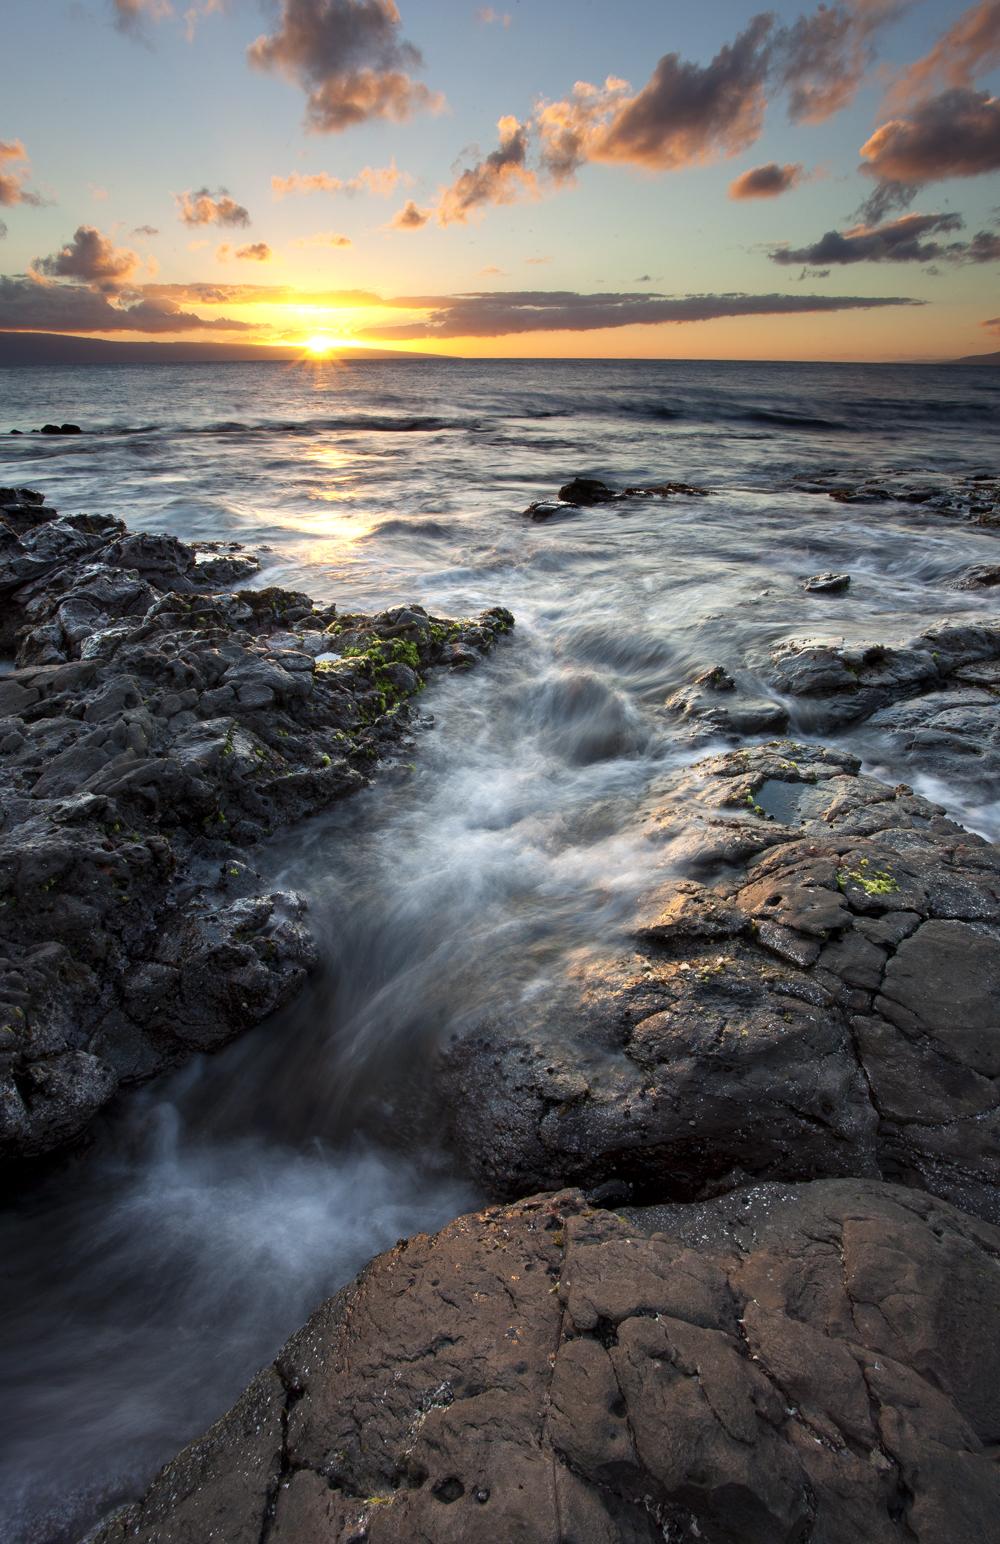 Turtle Bay, Napili Maui, HI